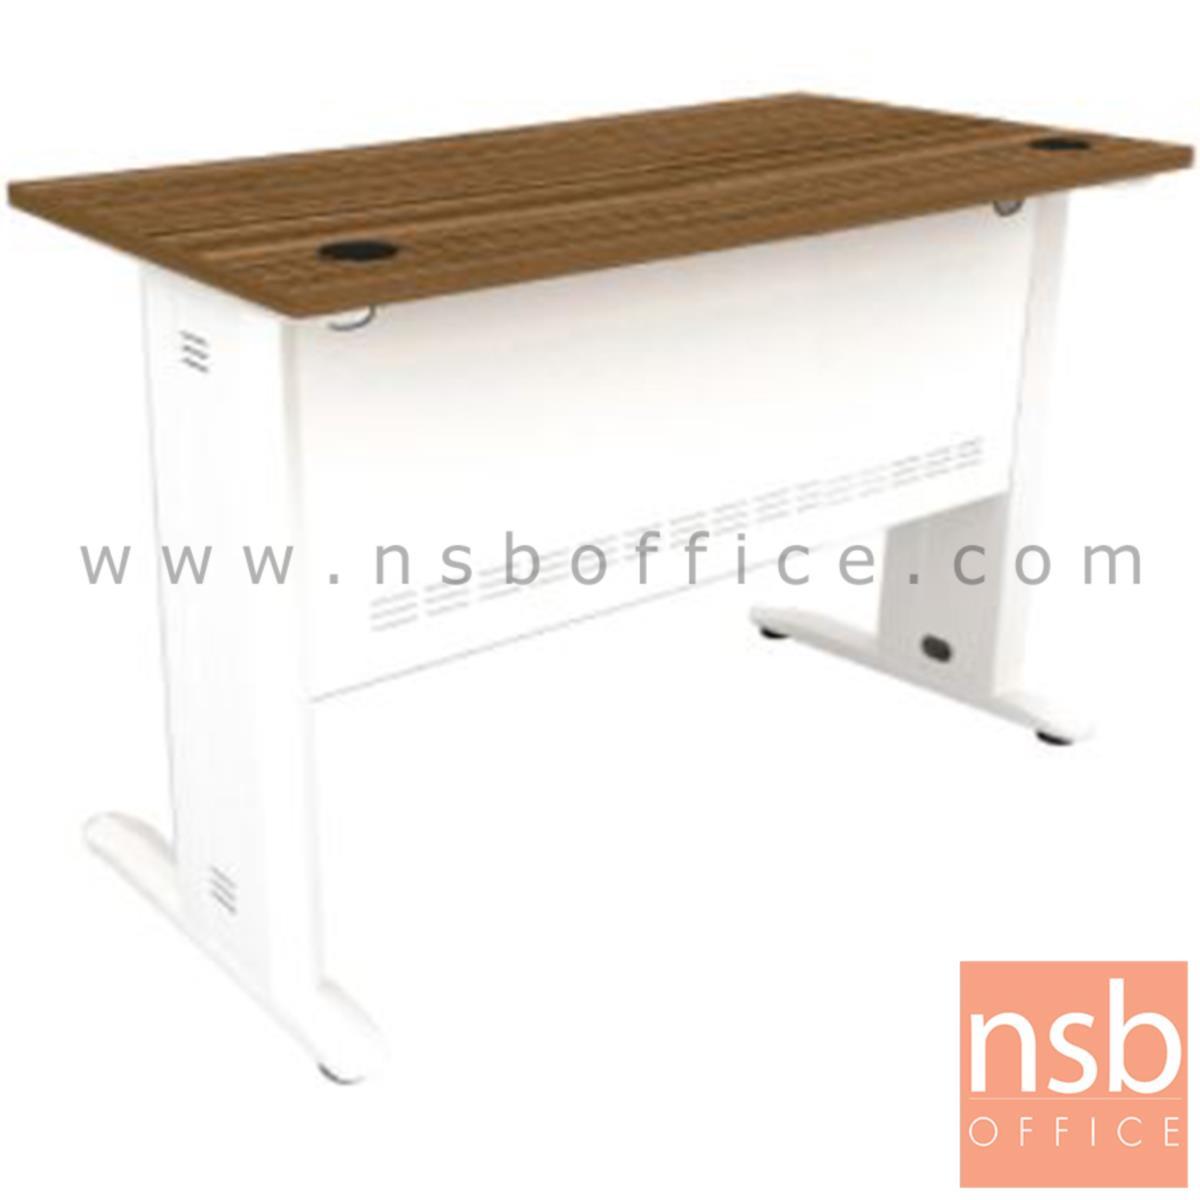 A34A006:โต๊ะทำงาน รุ่น Rosie (โรซี่) ขนาด 120W ,160W cm.  สีซีบราโน่-ขาว